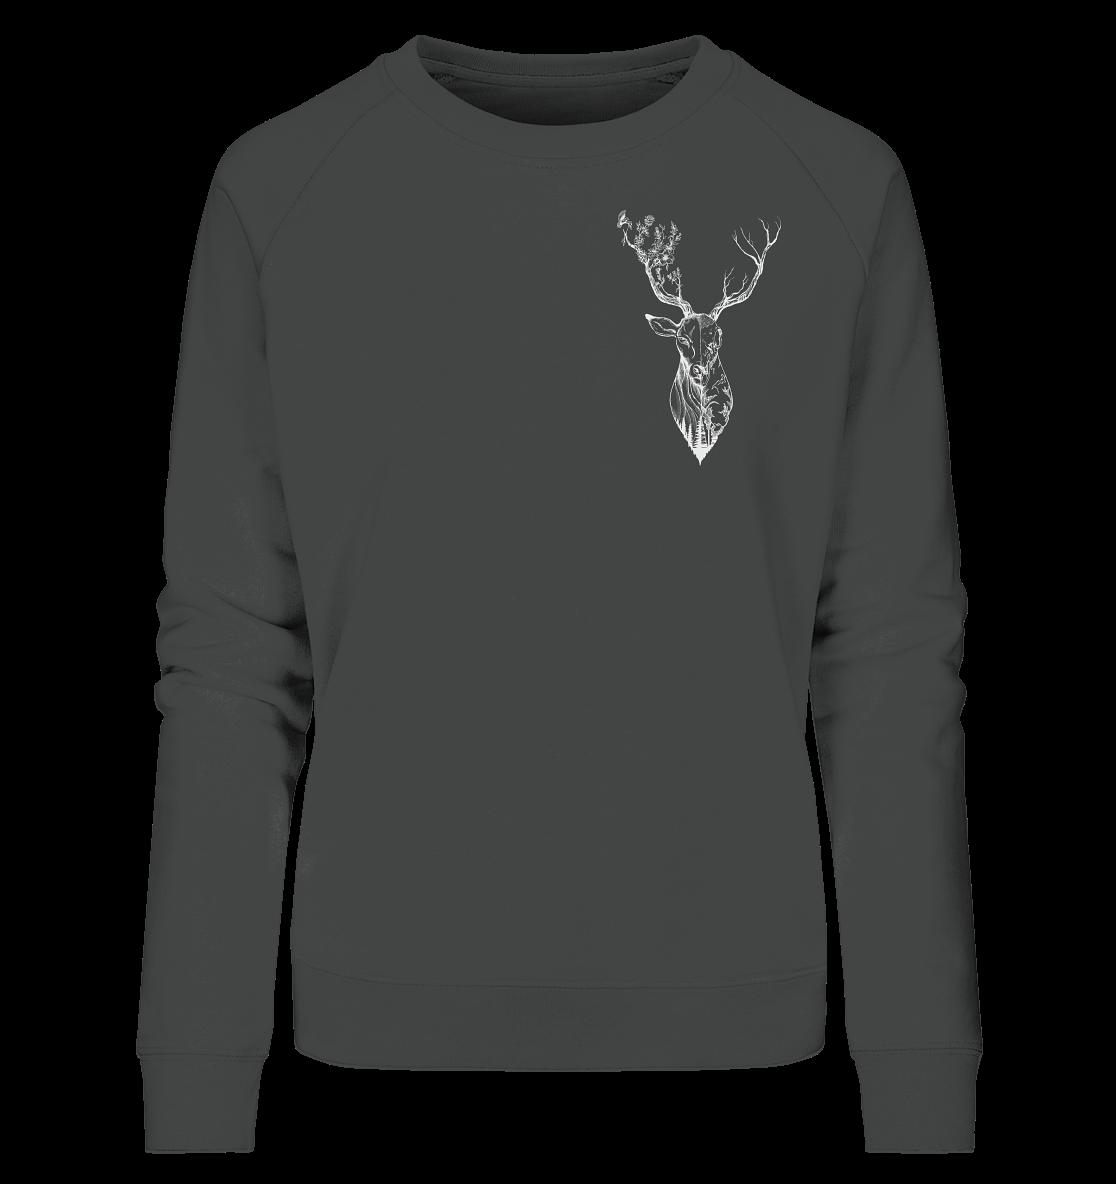 front-ladies-organic-sweatshirt-444545-1116x-6.png